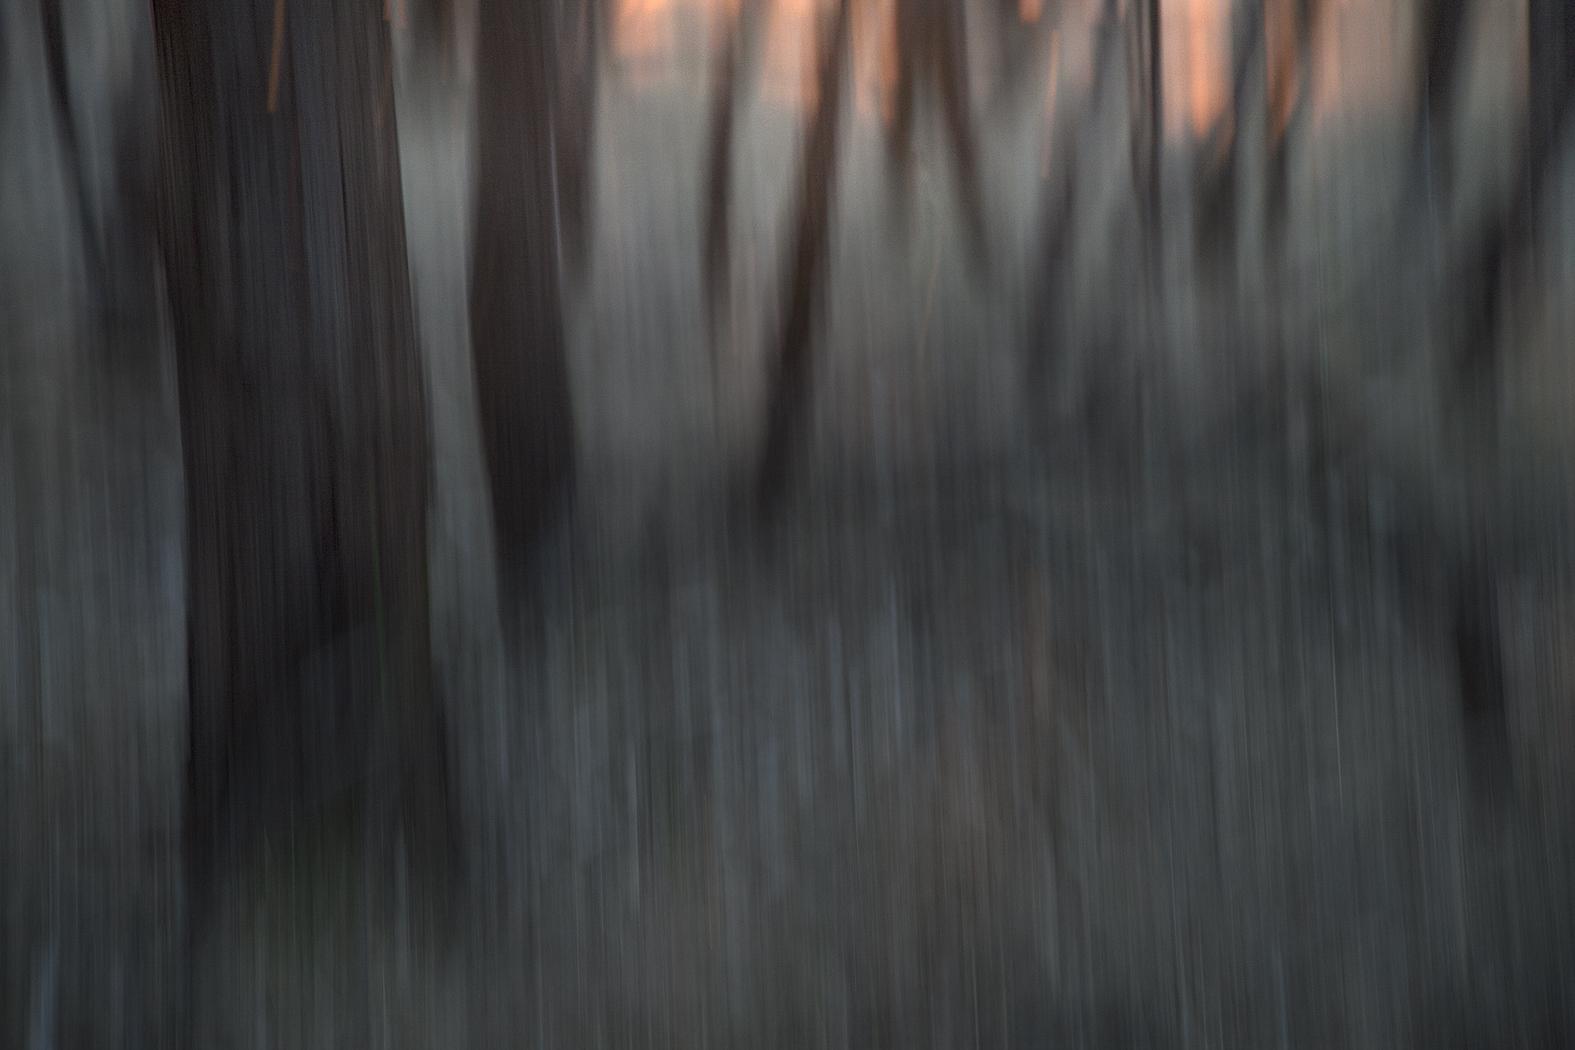 woodlands_#7.jpg